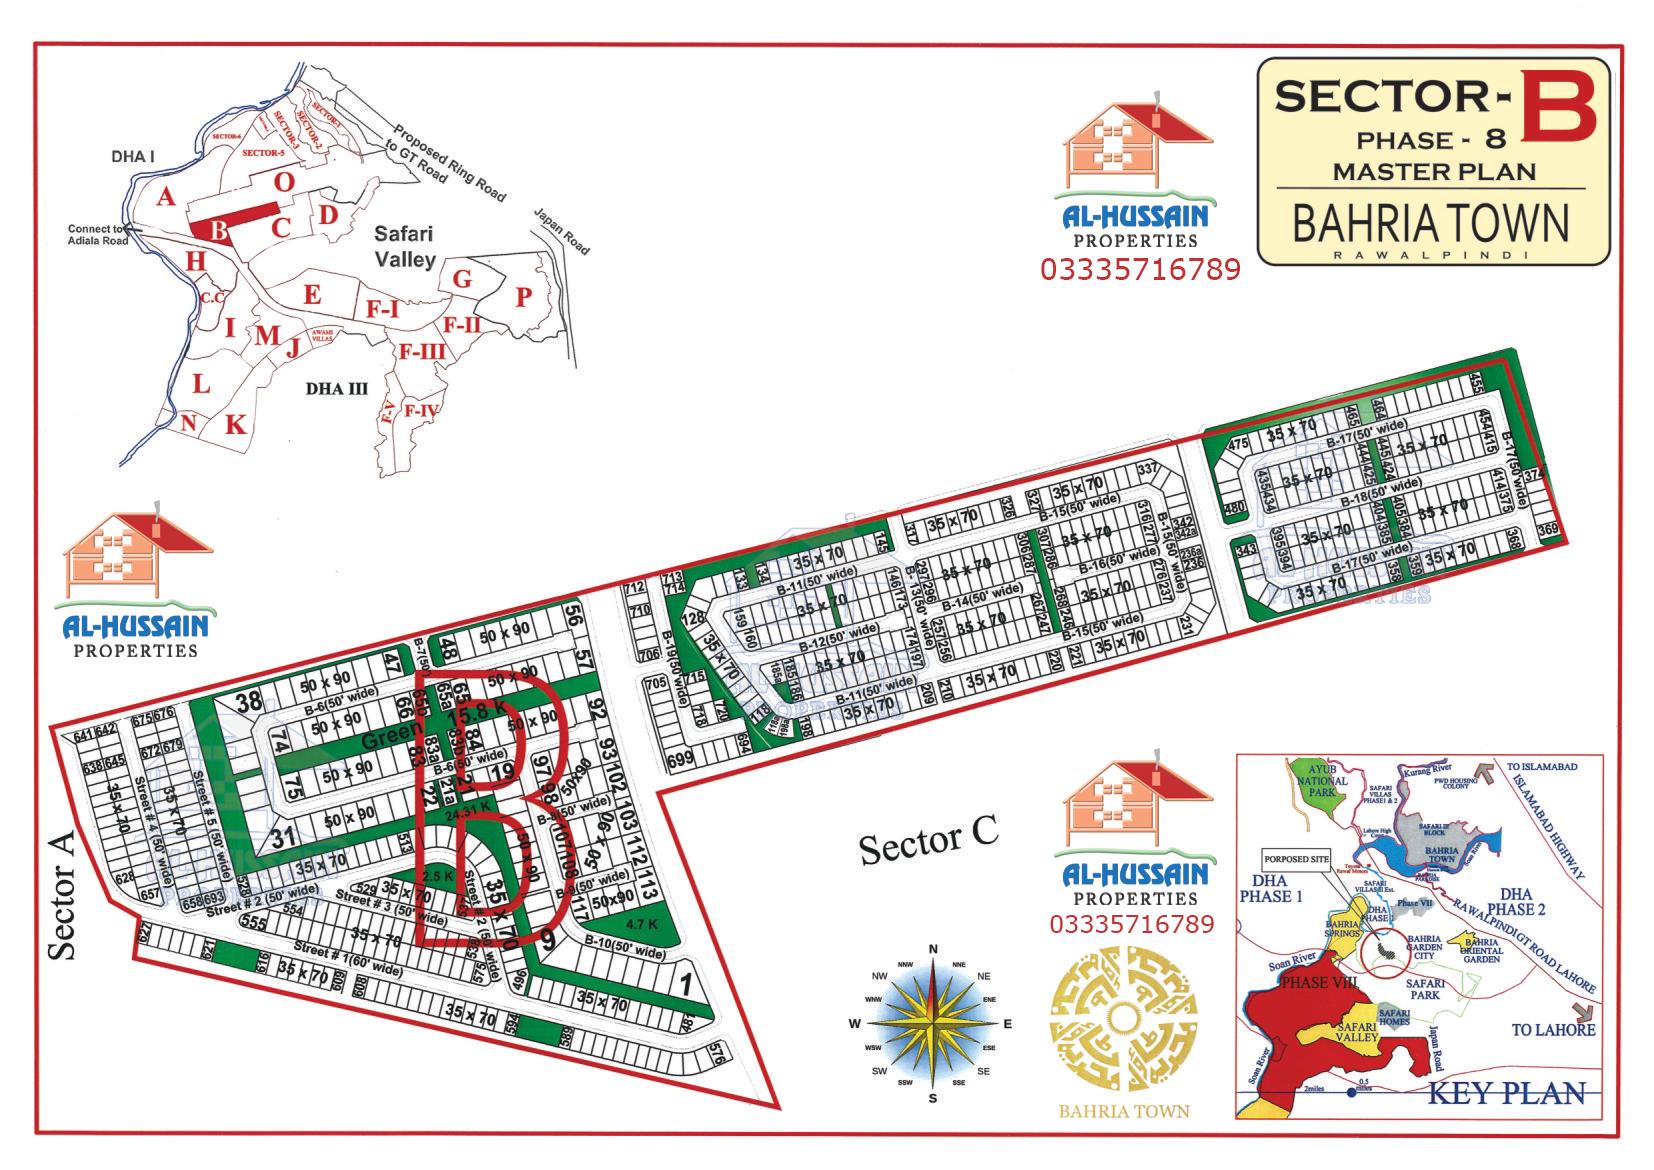 Sector B Phase 8 Bahria Town Rawalpindi